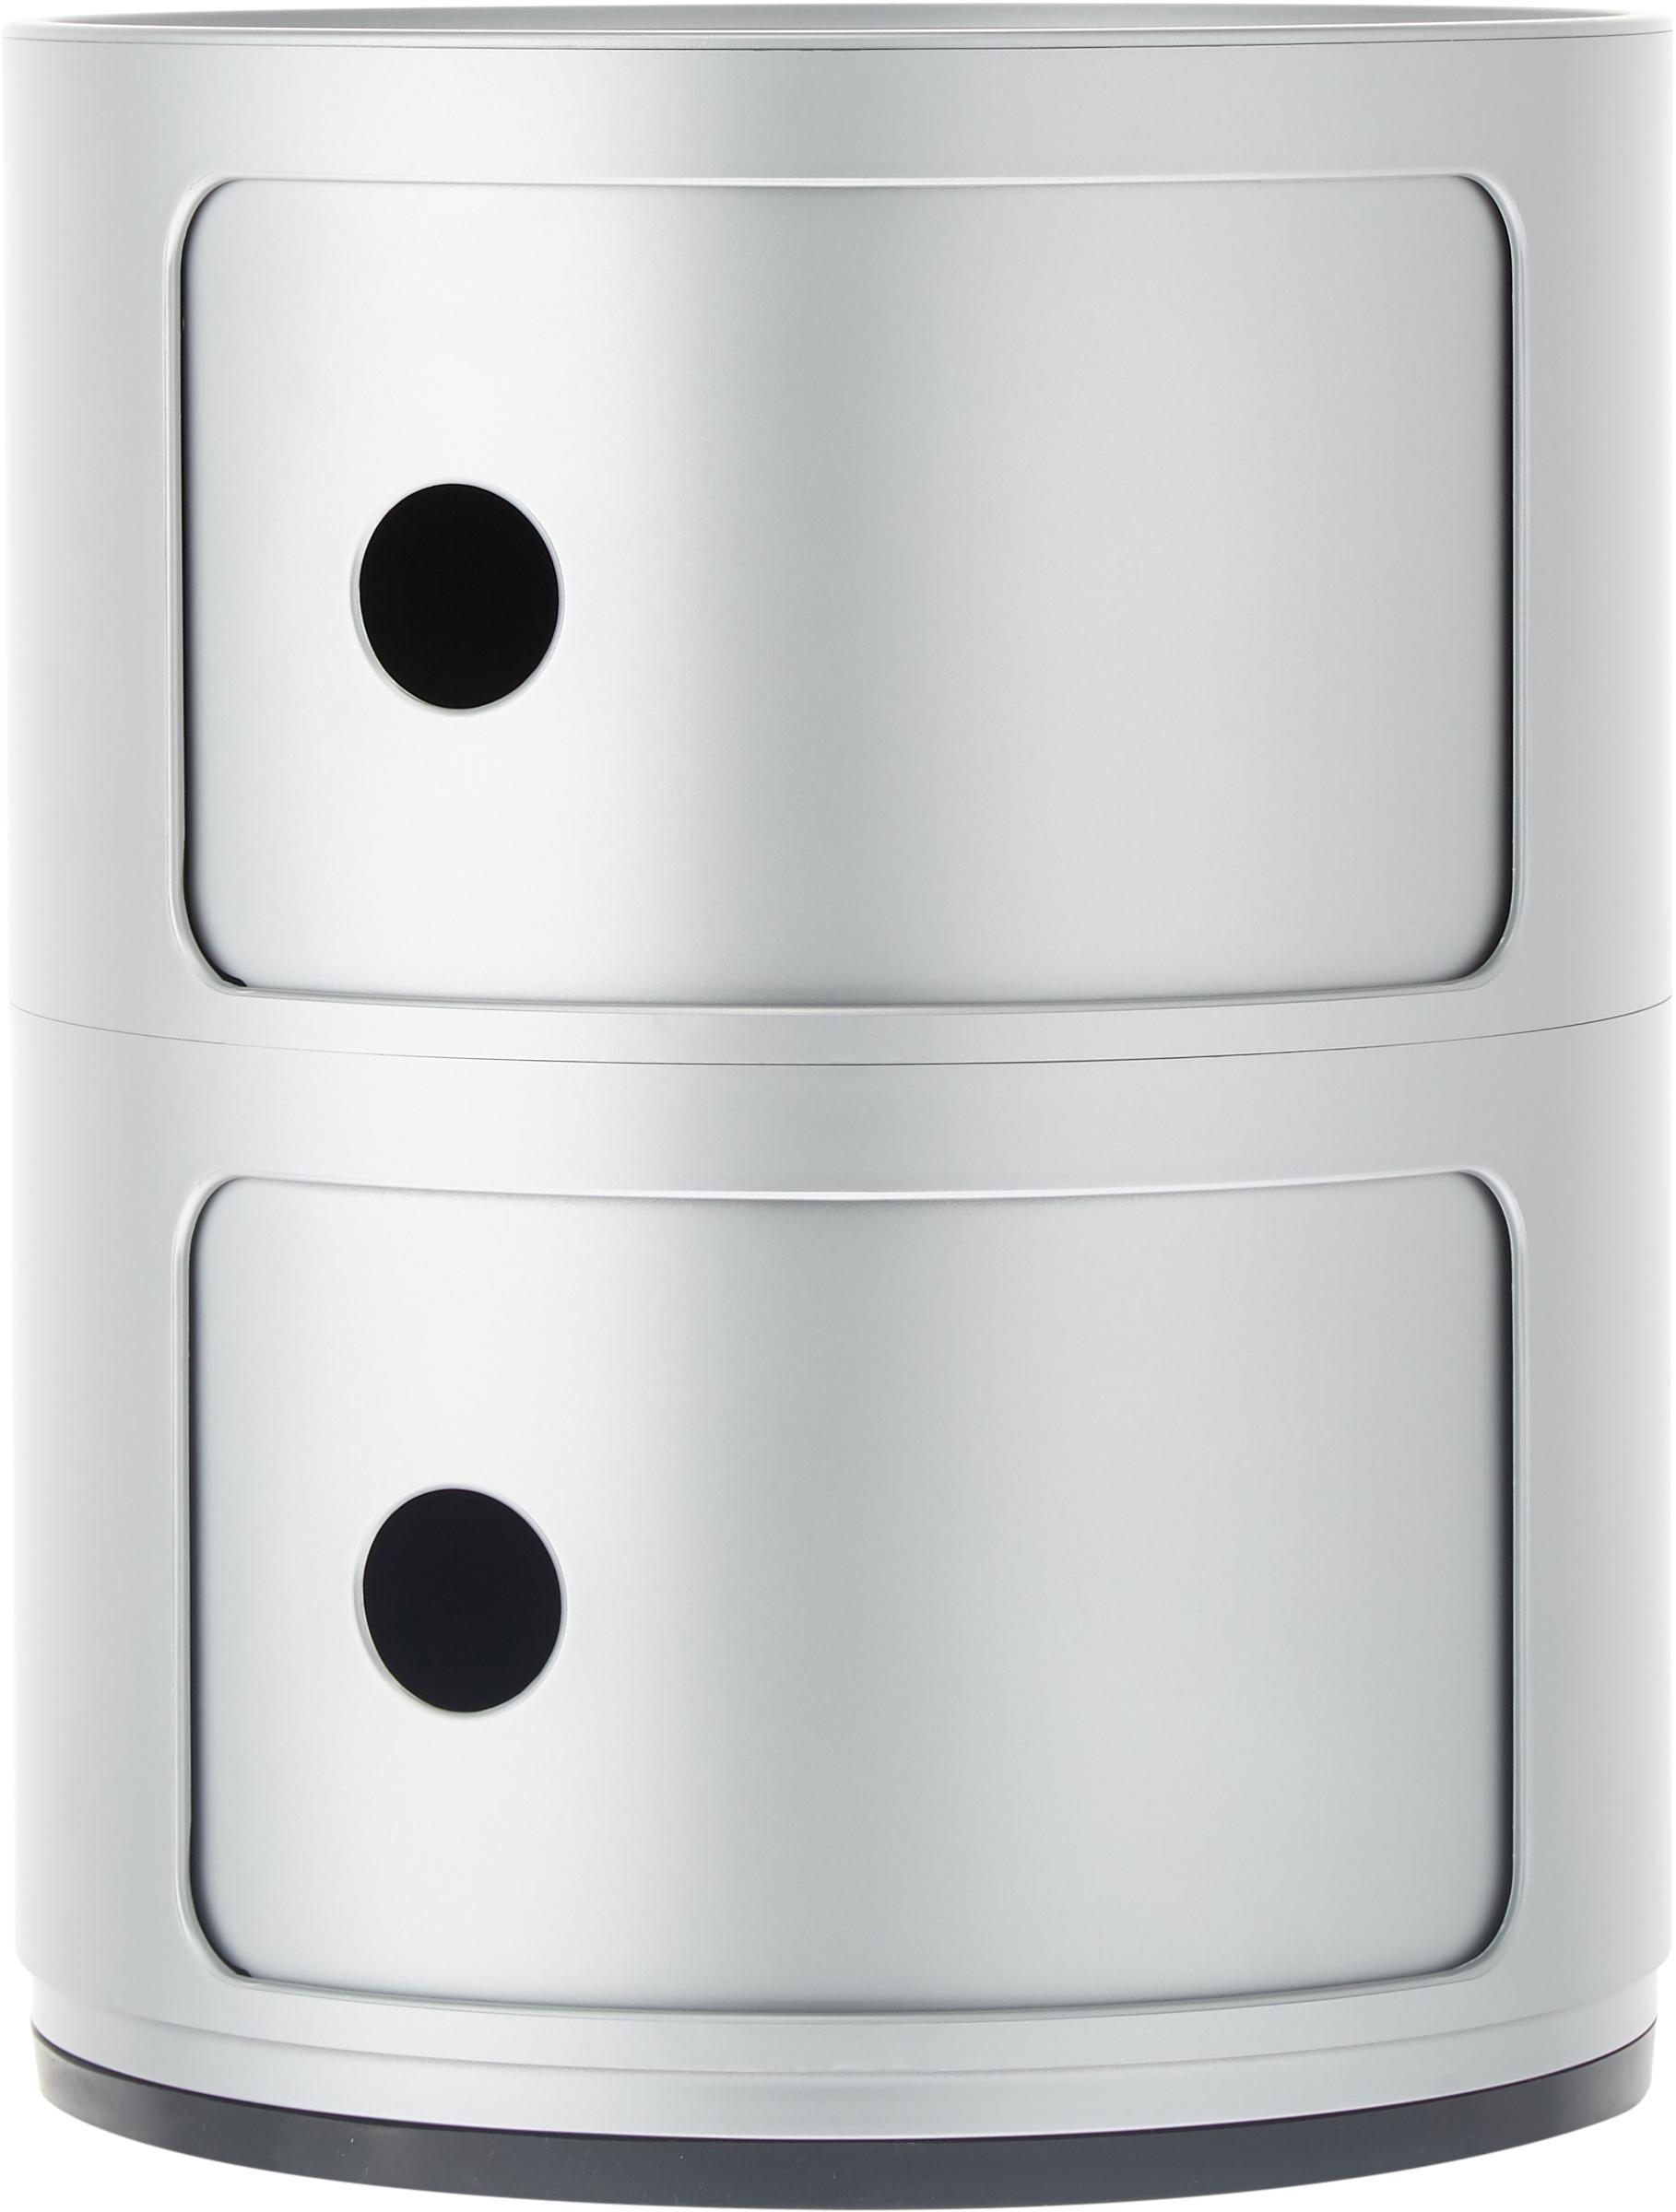 Kleine design container Componibile, Kunststof, Zilverkleurig, Ø 32 x H 40 cm